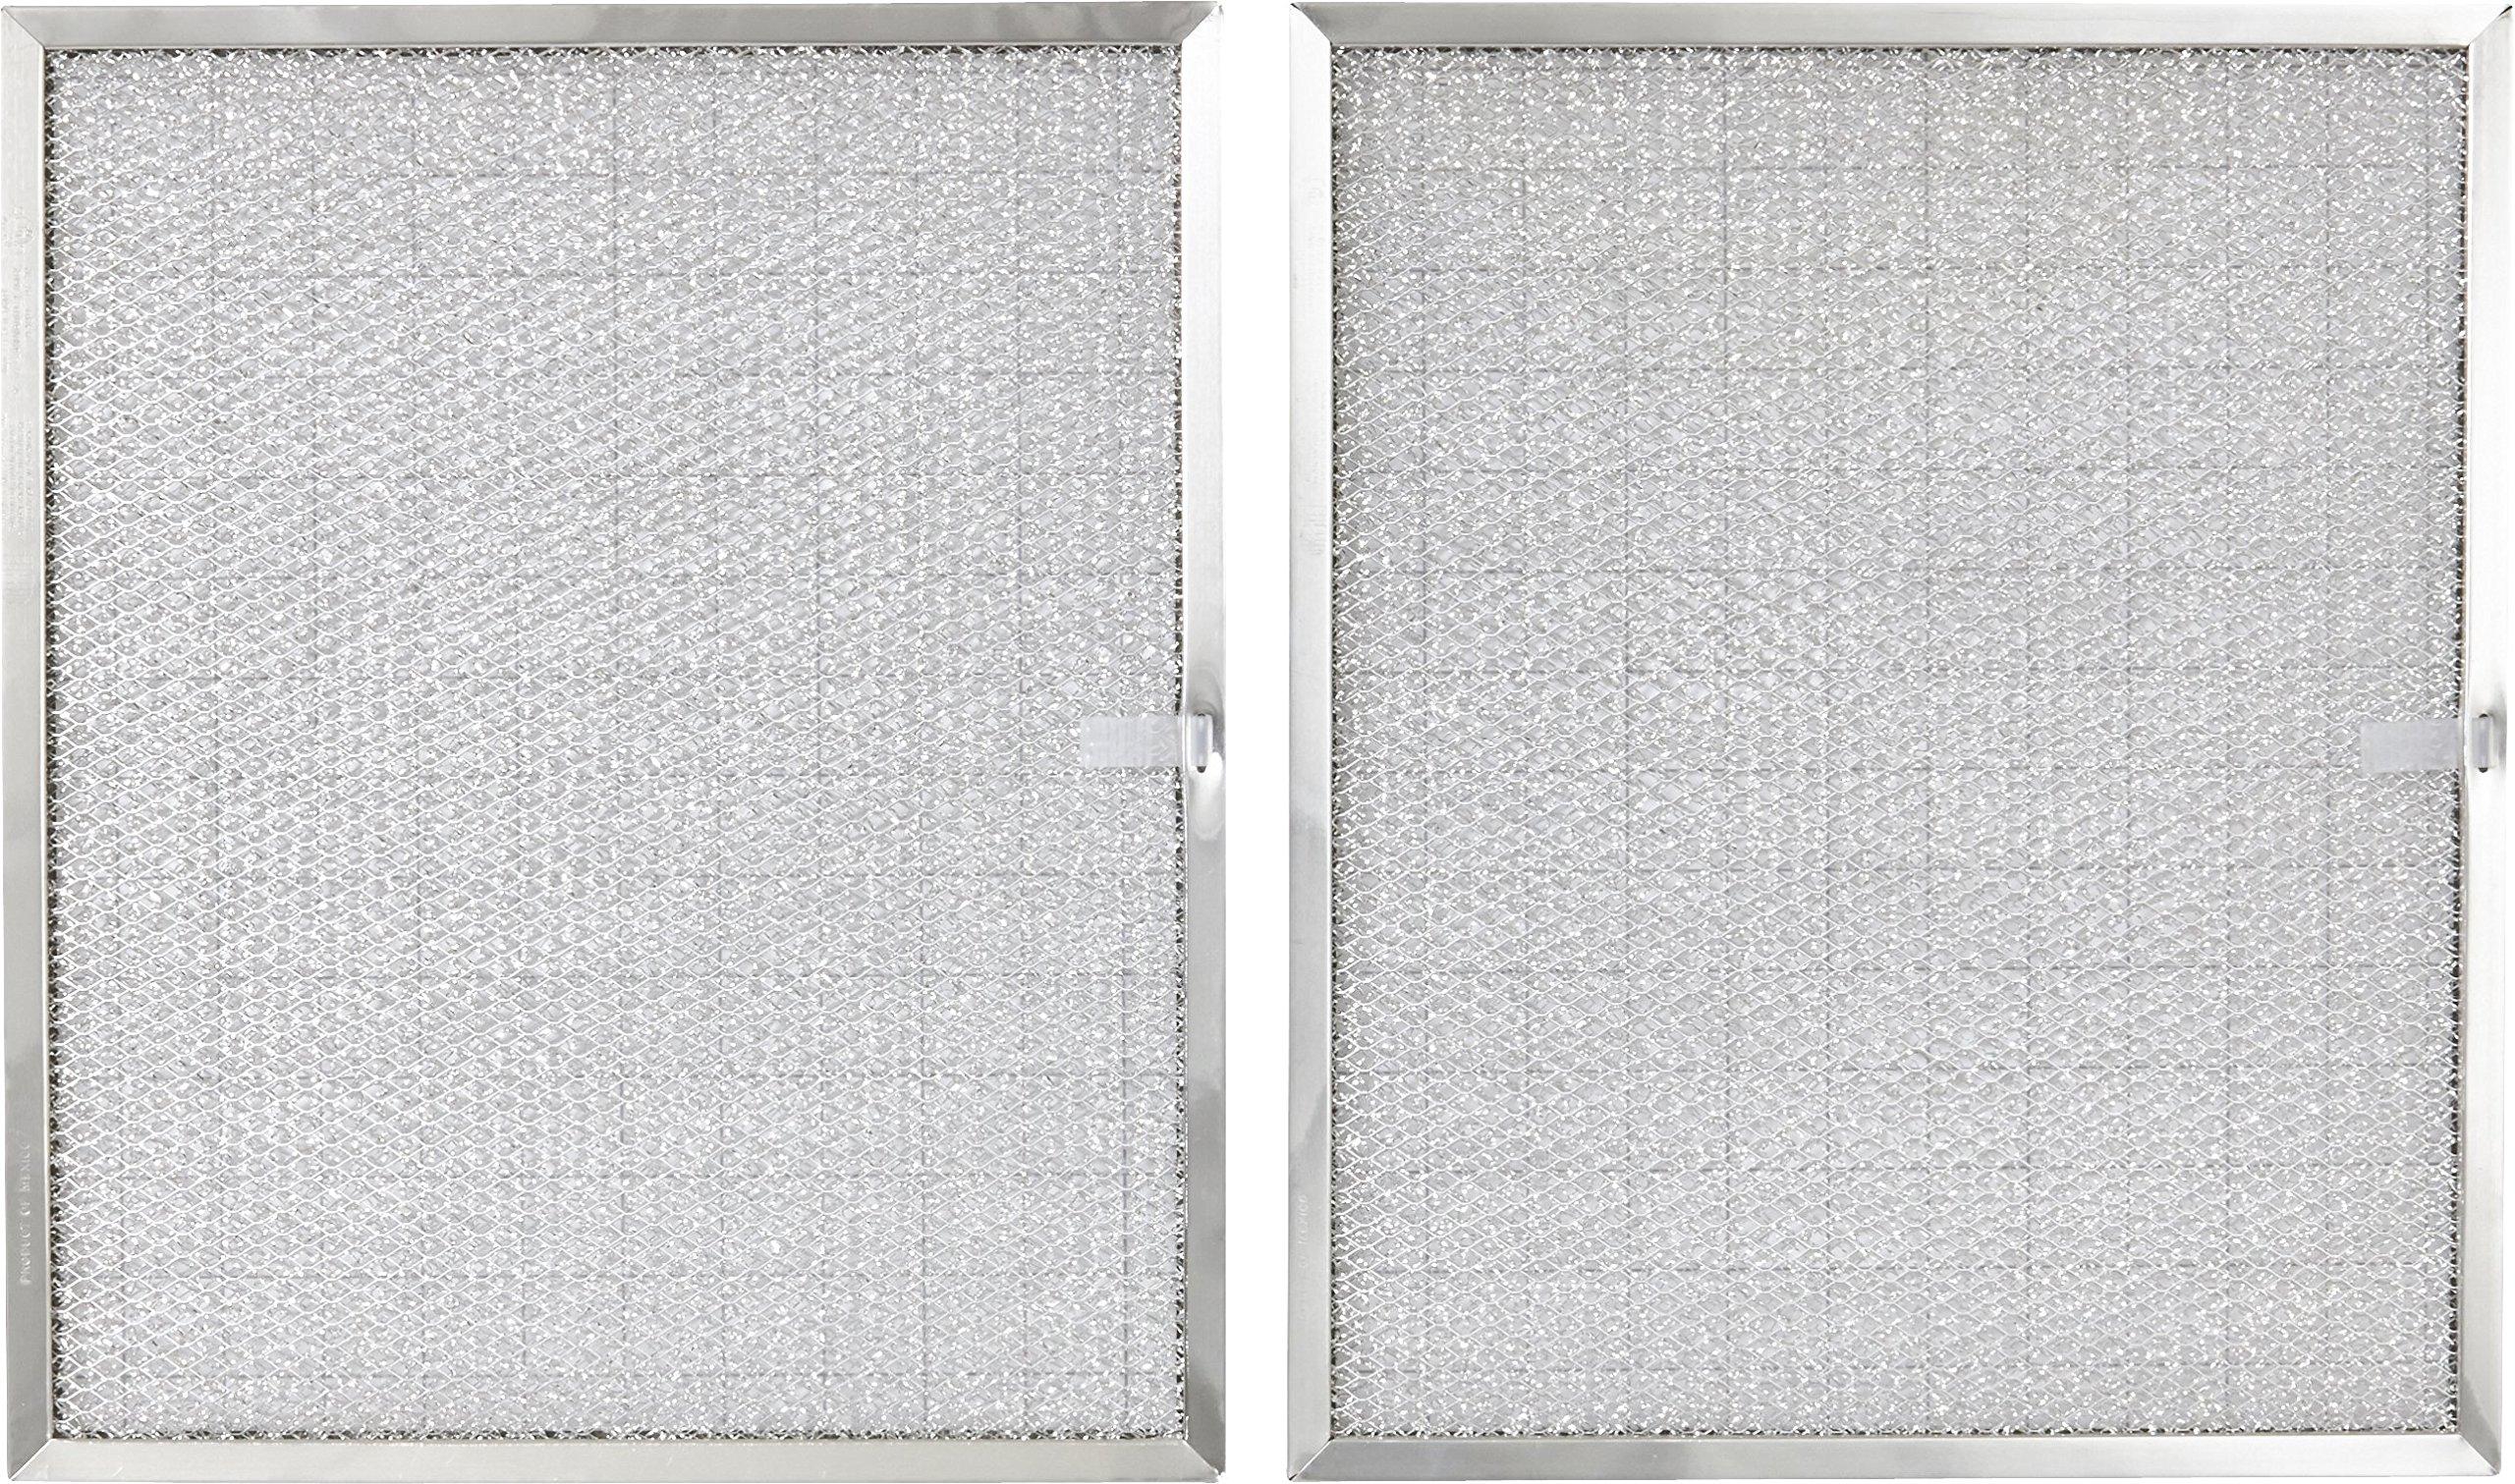 Broan Filter, Set of 2 by Broan